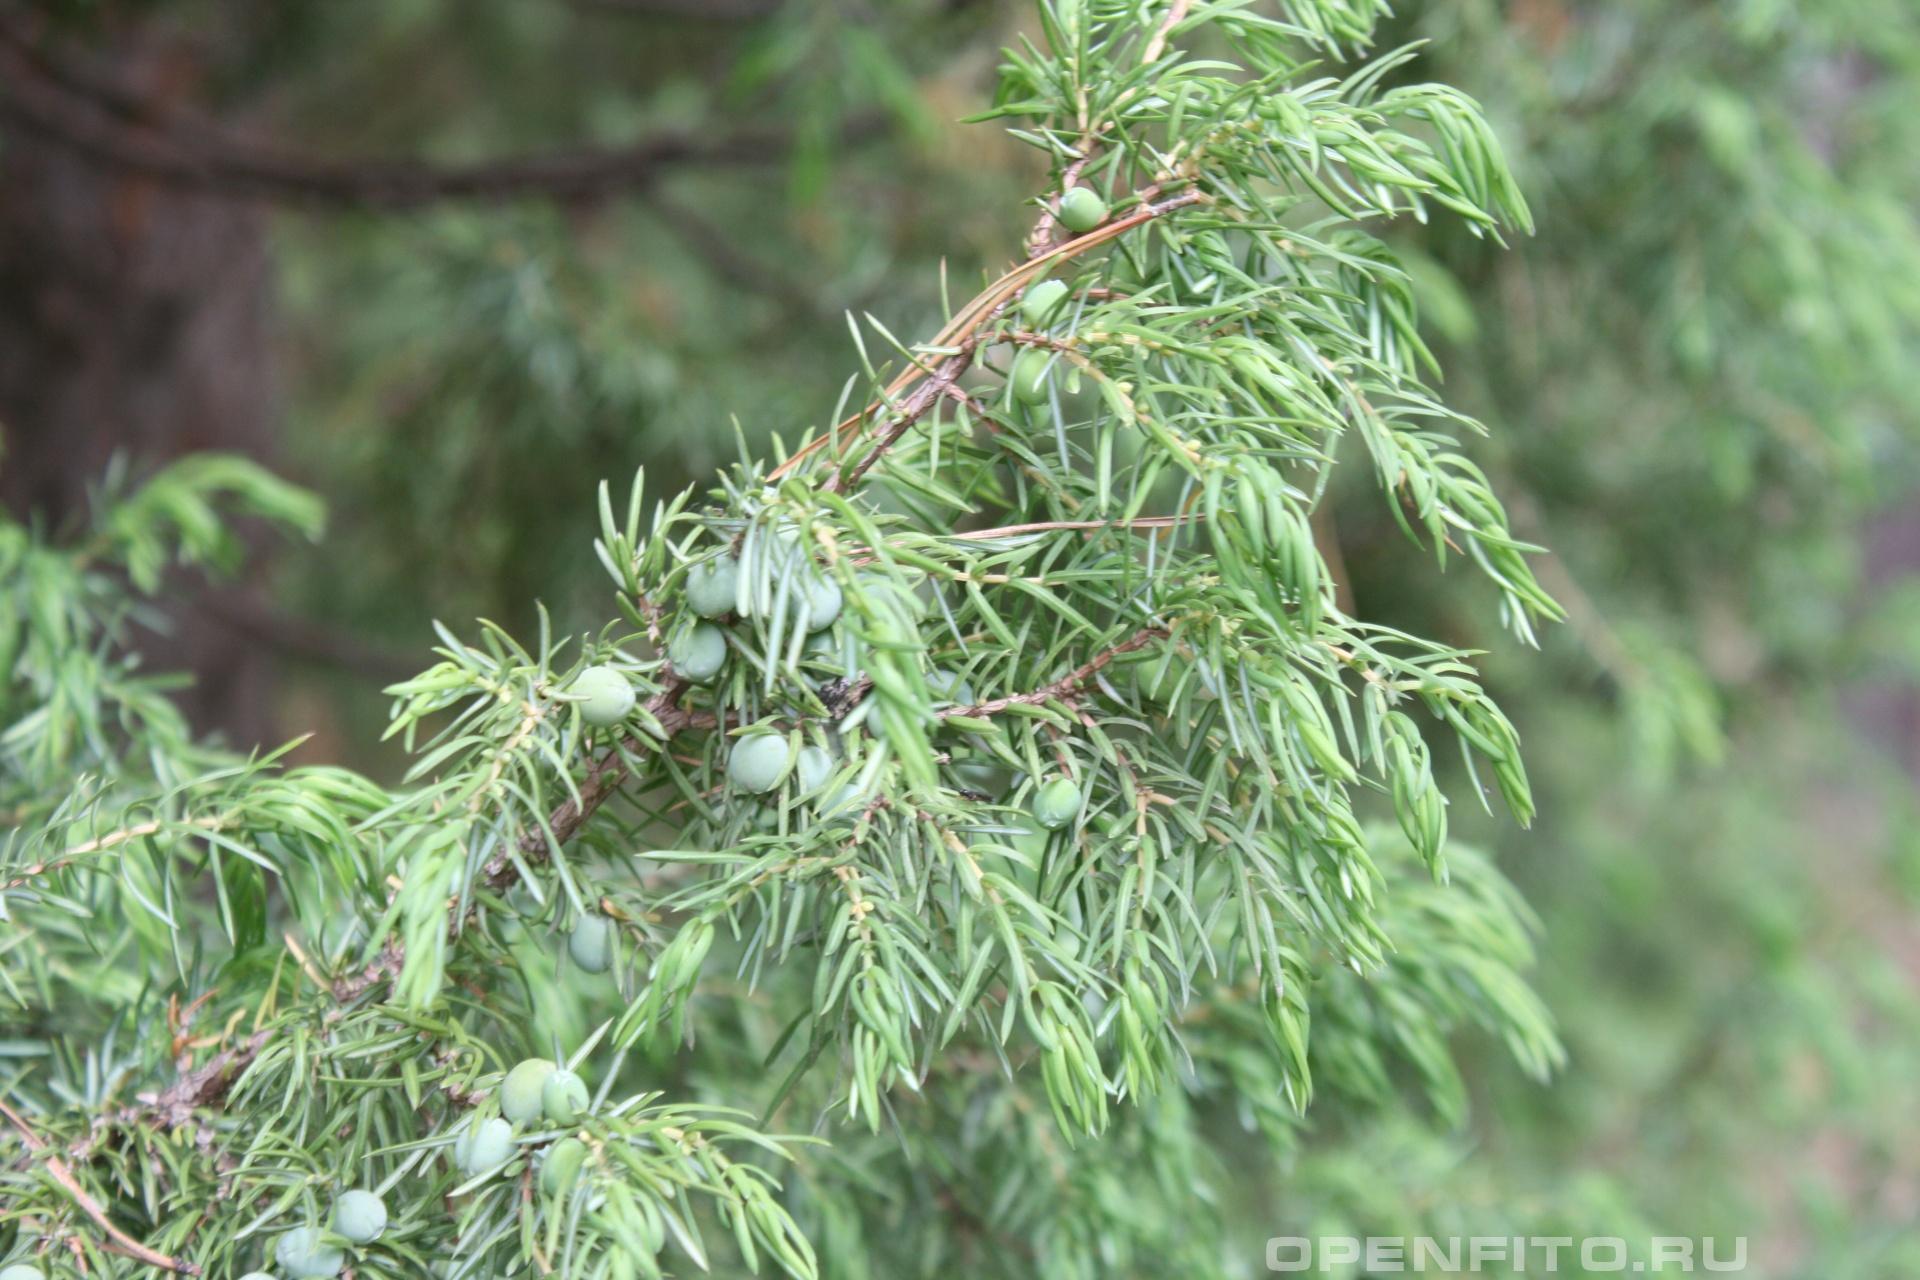 Можжевельник незрелые плоды можжевельника обыкновенного